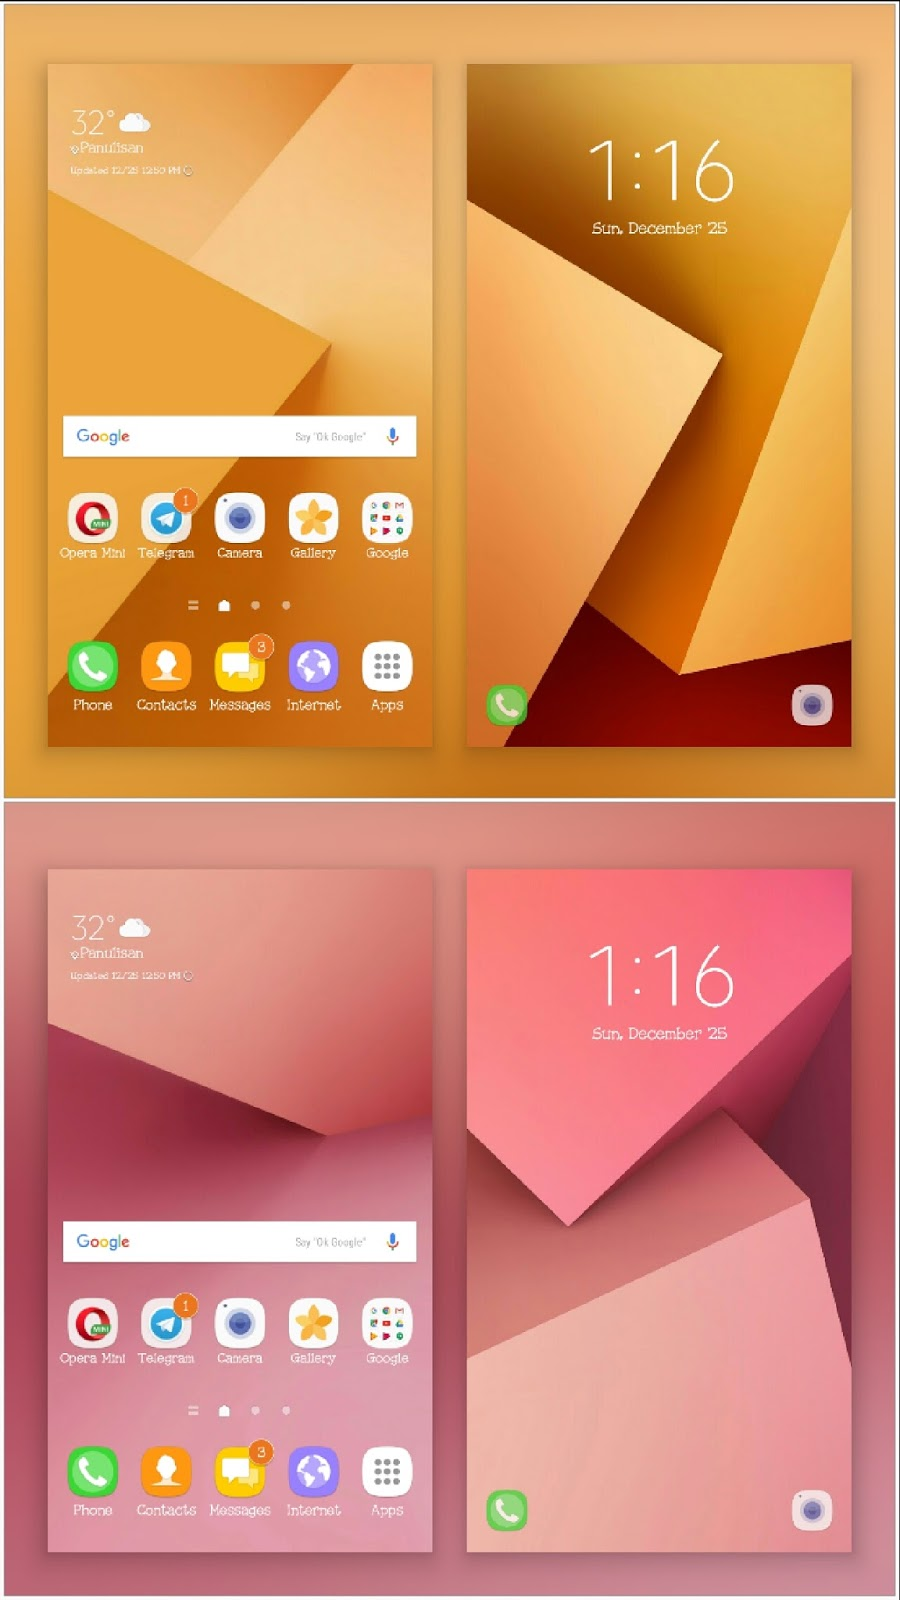 Samsung C9 Wallpaper Untuk Samsung Galaxy J2 Prime 900x1600 Wallpaper Teahub Io